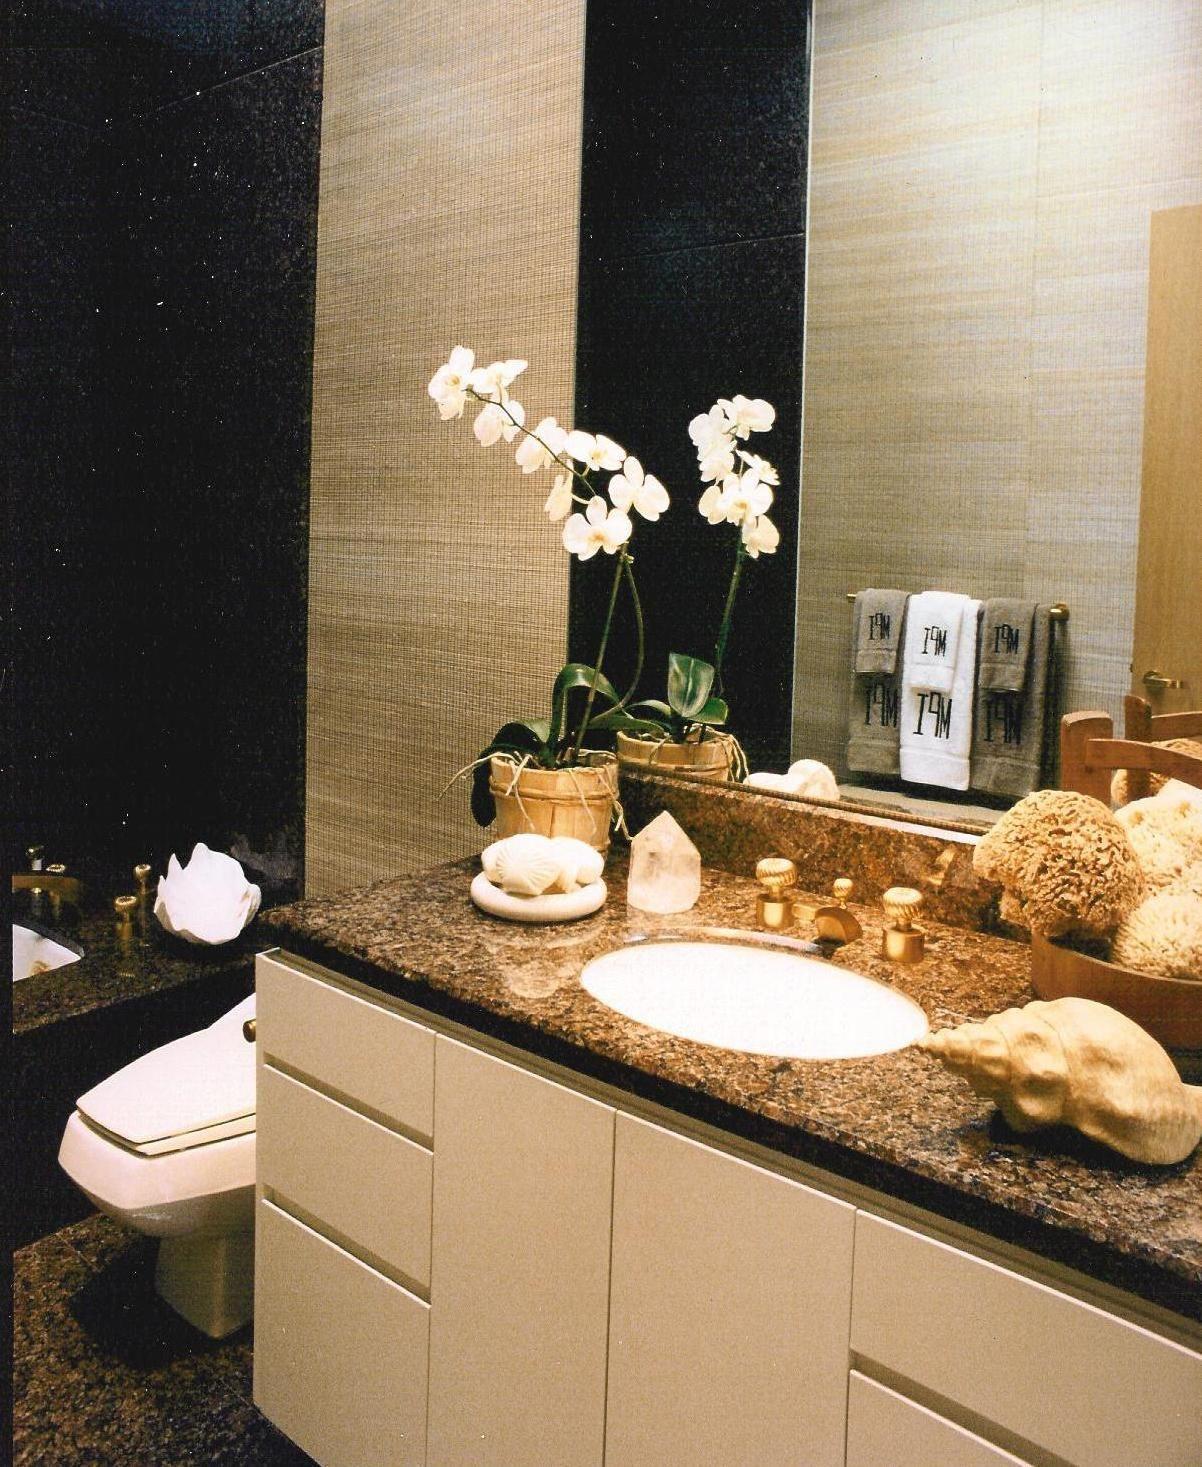 Suzanne Myers Elite Interior Design Masculine Gym Bathroom For Adorable Gym Bathroom Designs Design Decoration